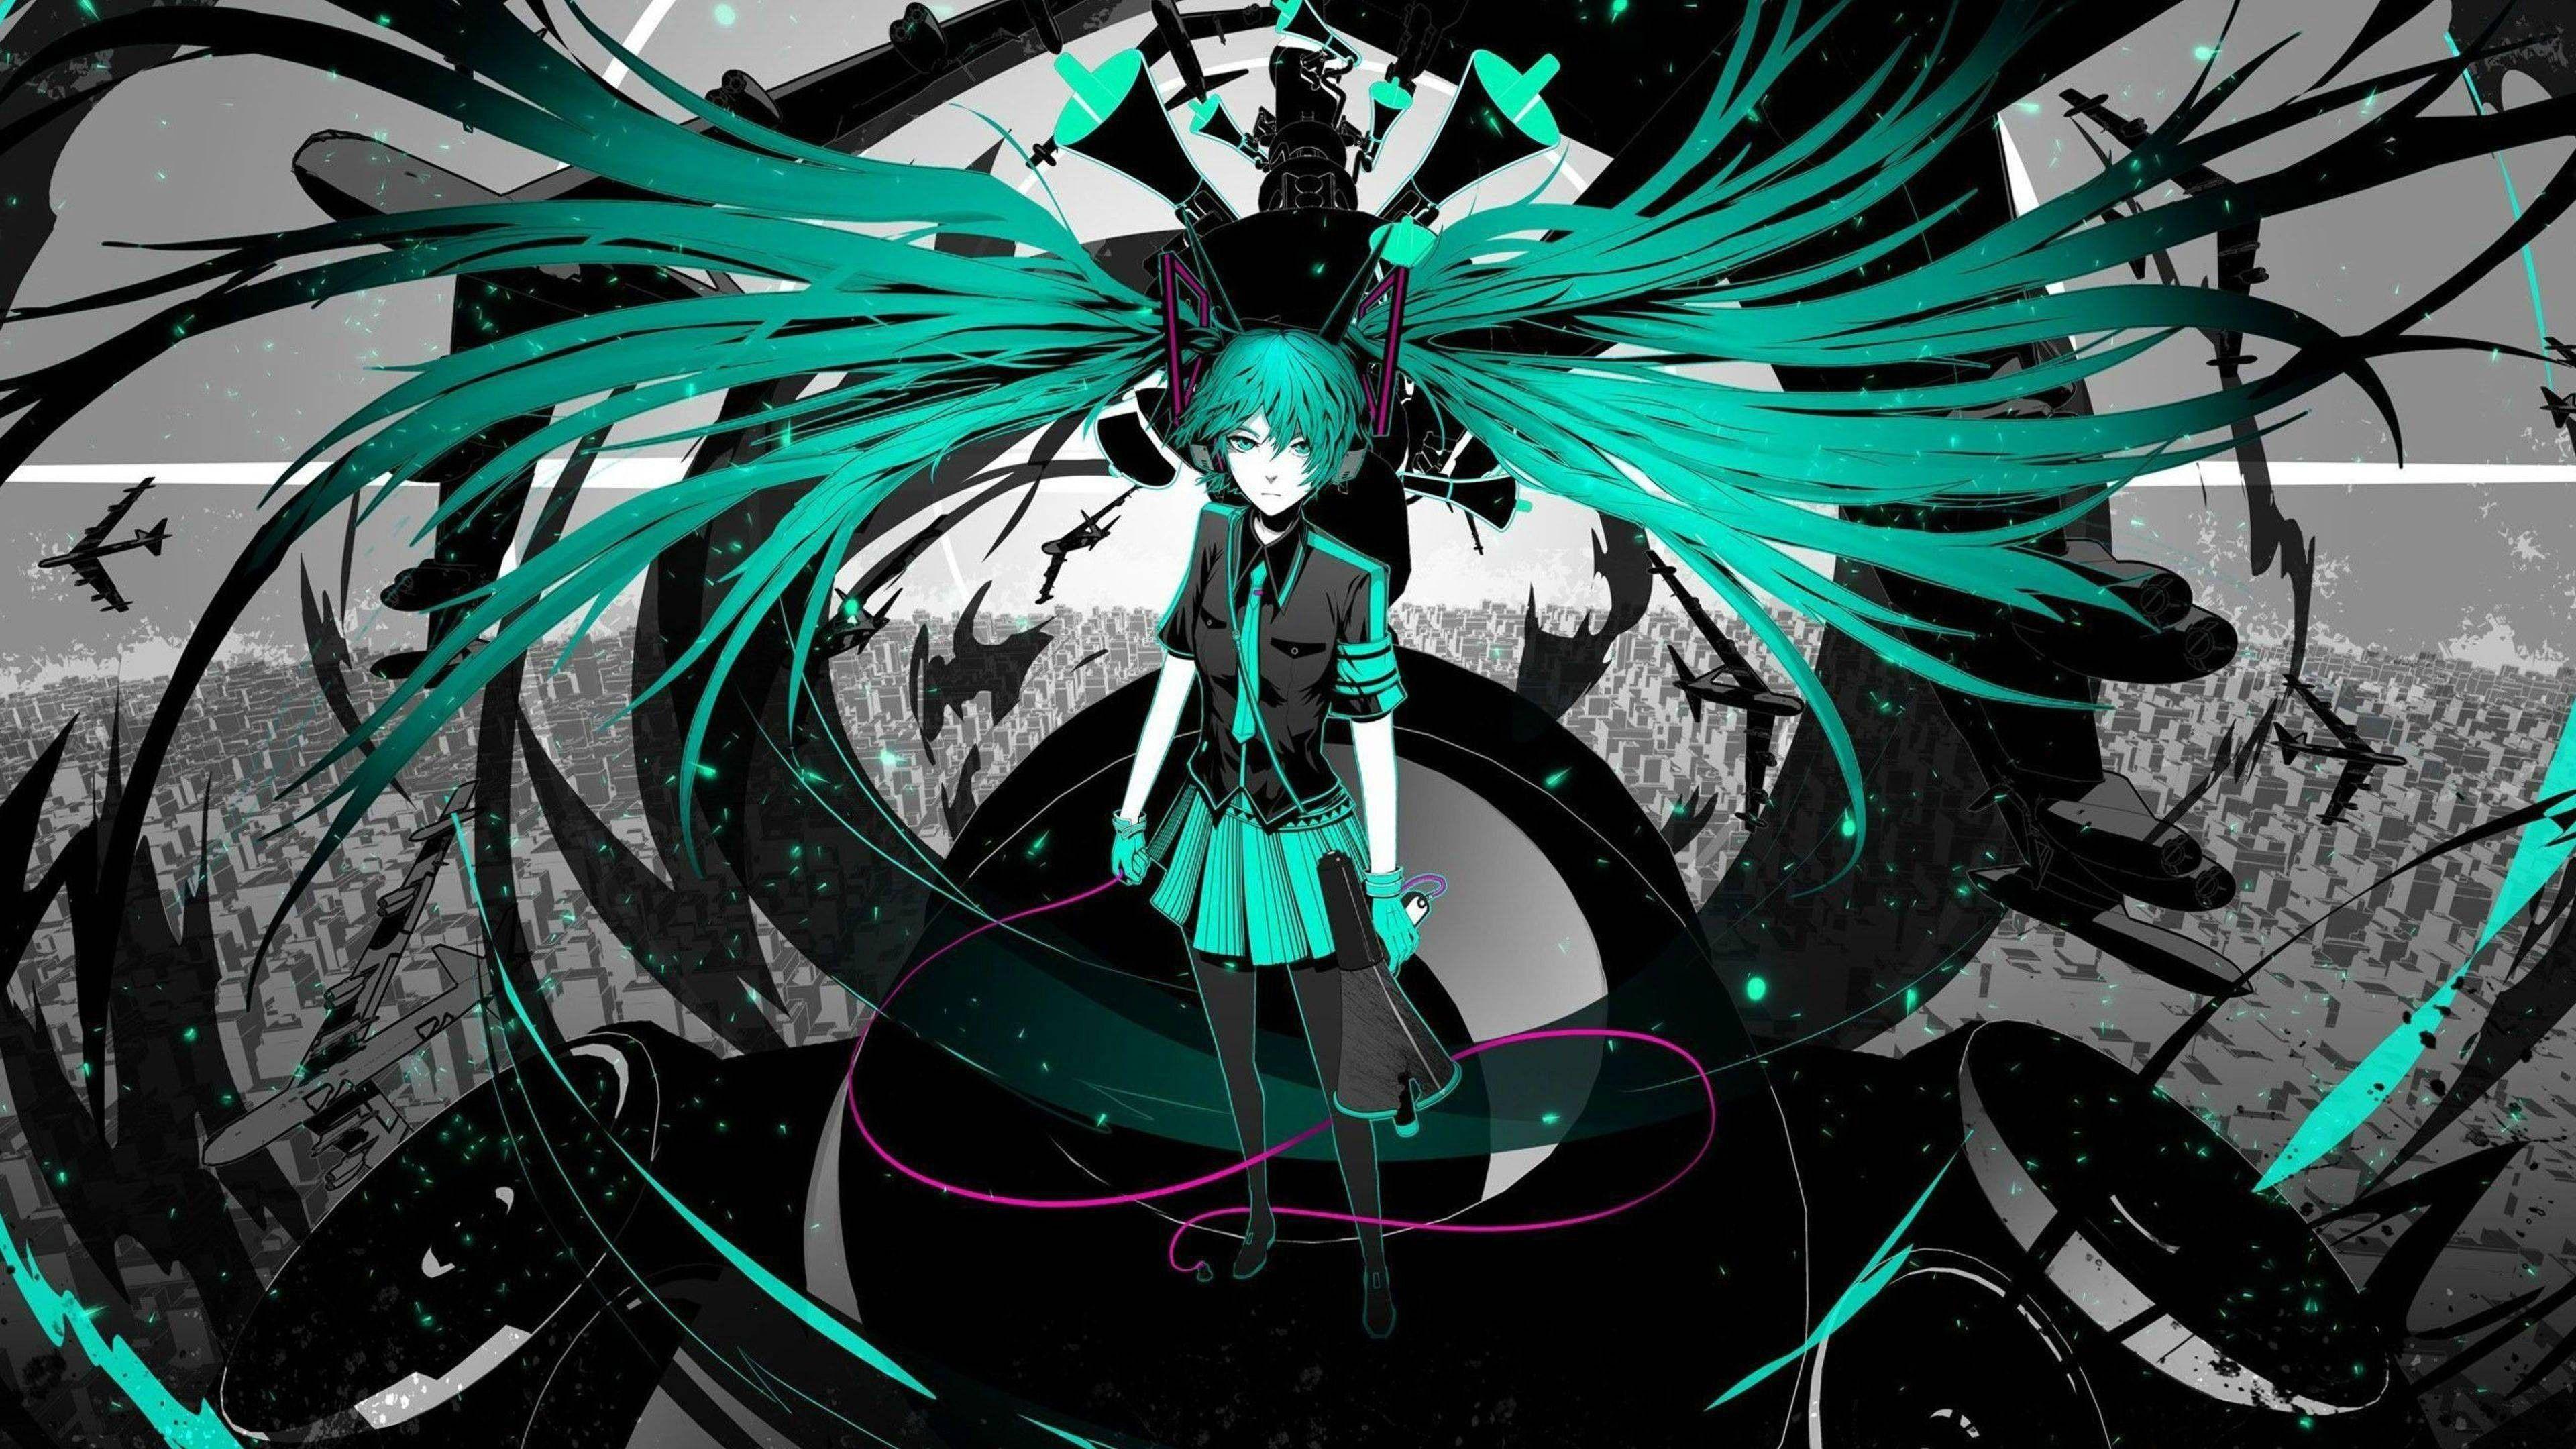 Windows 10 Wallpaper Anime In 2020 Hatsune Miku Vocaloid